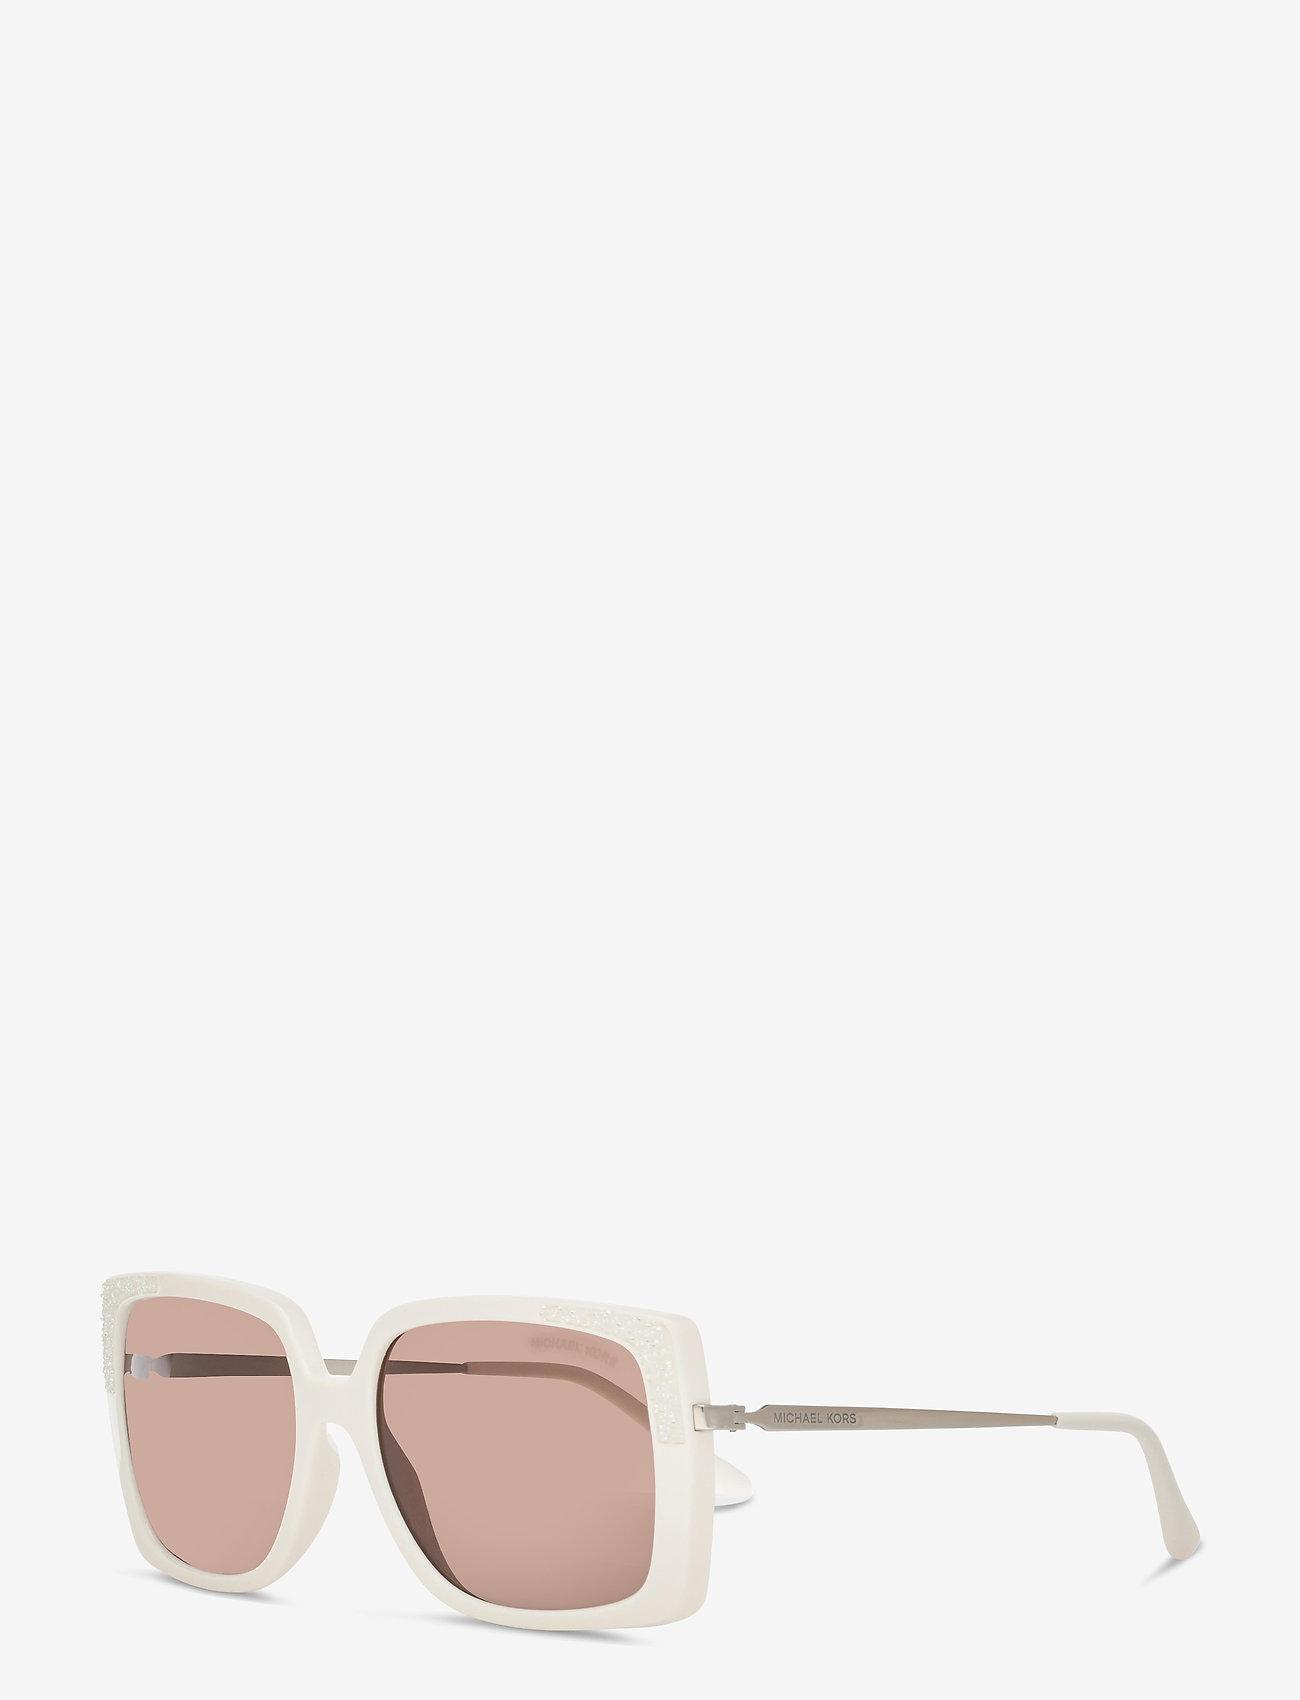 Michael Kors Sunglasses - ROCHELLE - rechthoekig model - brown solid - 1